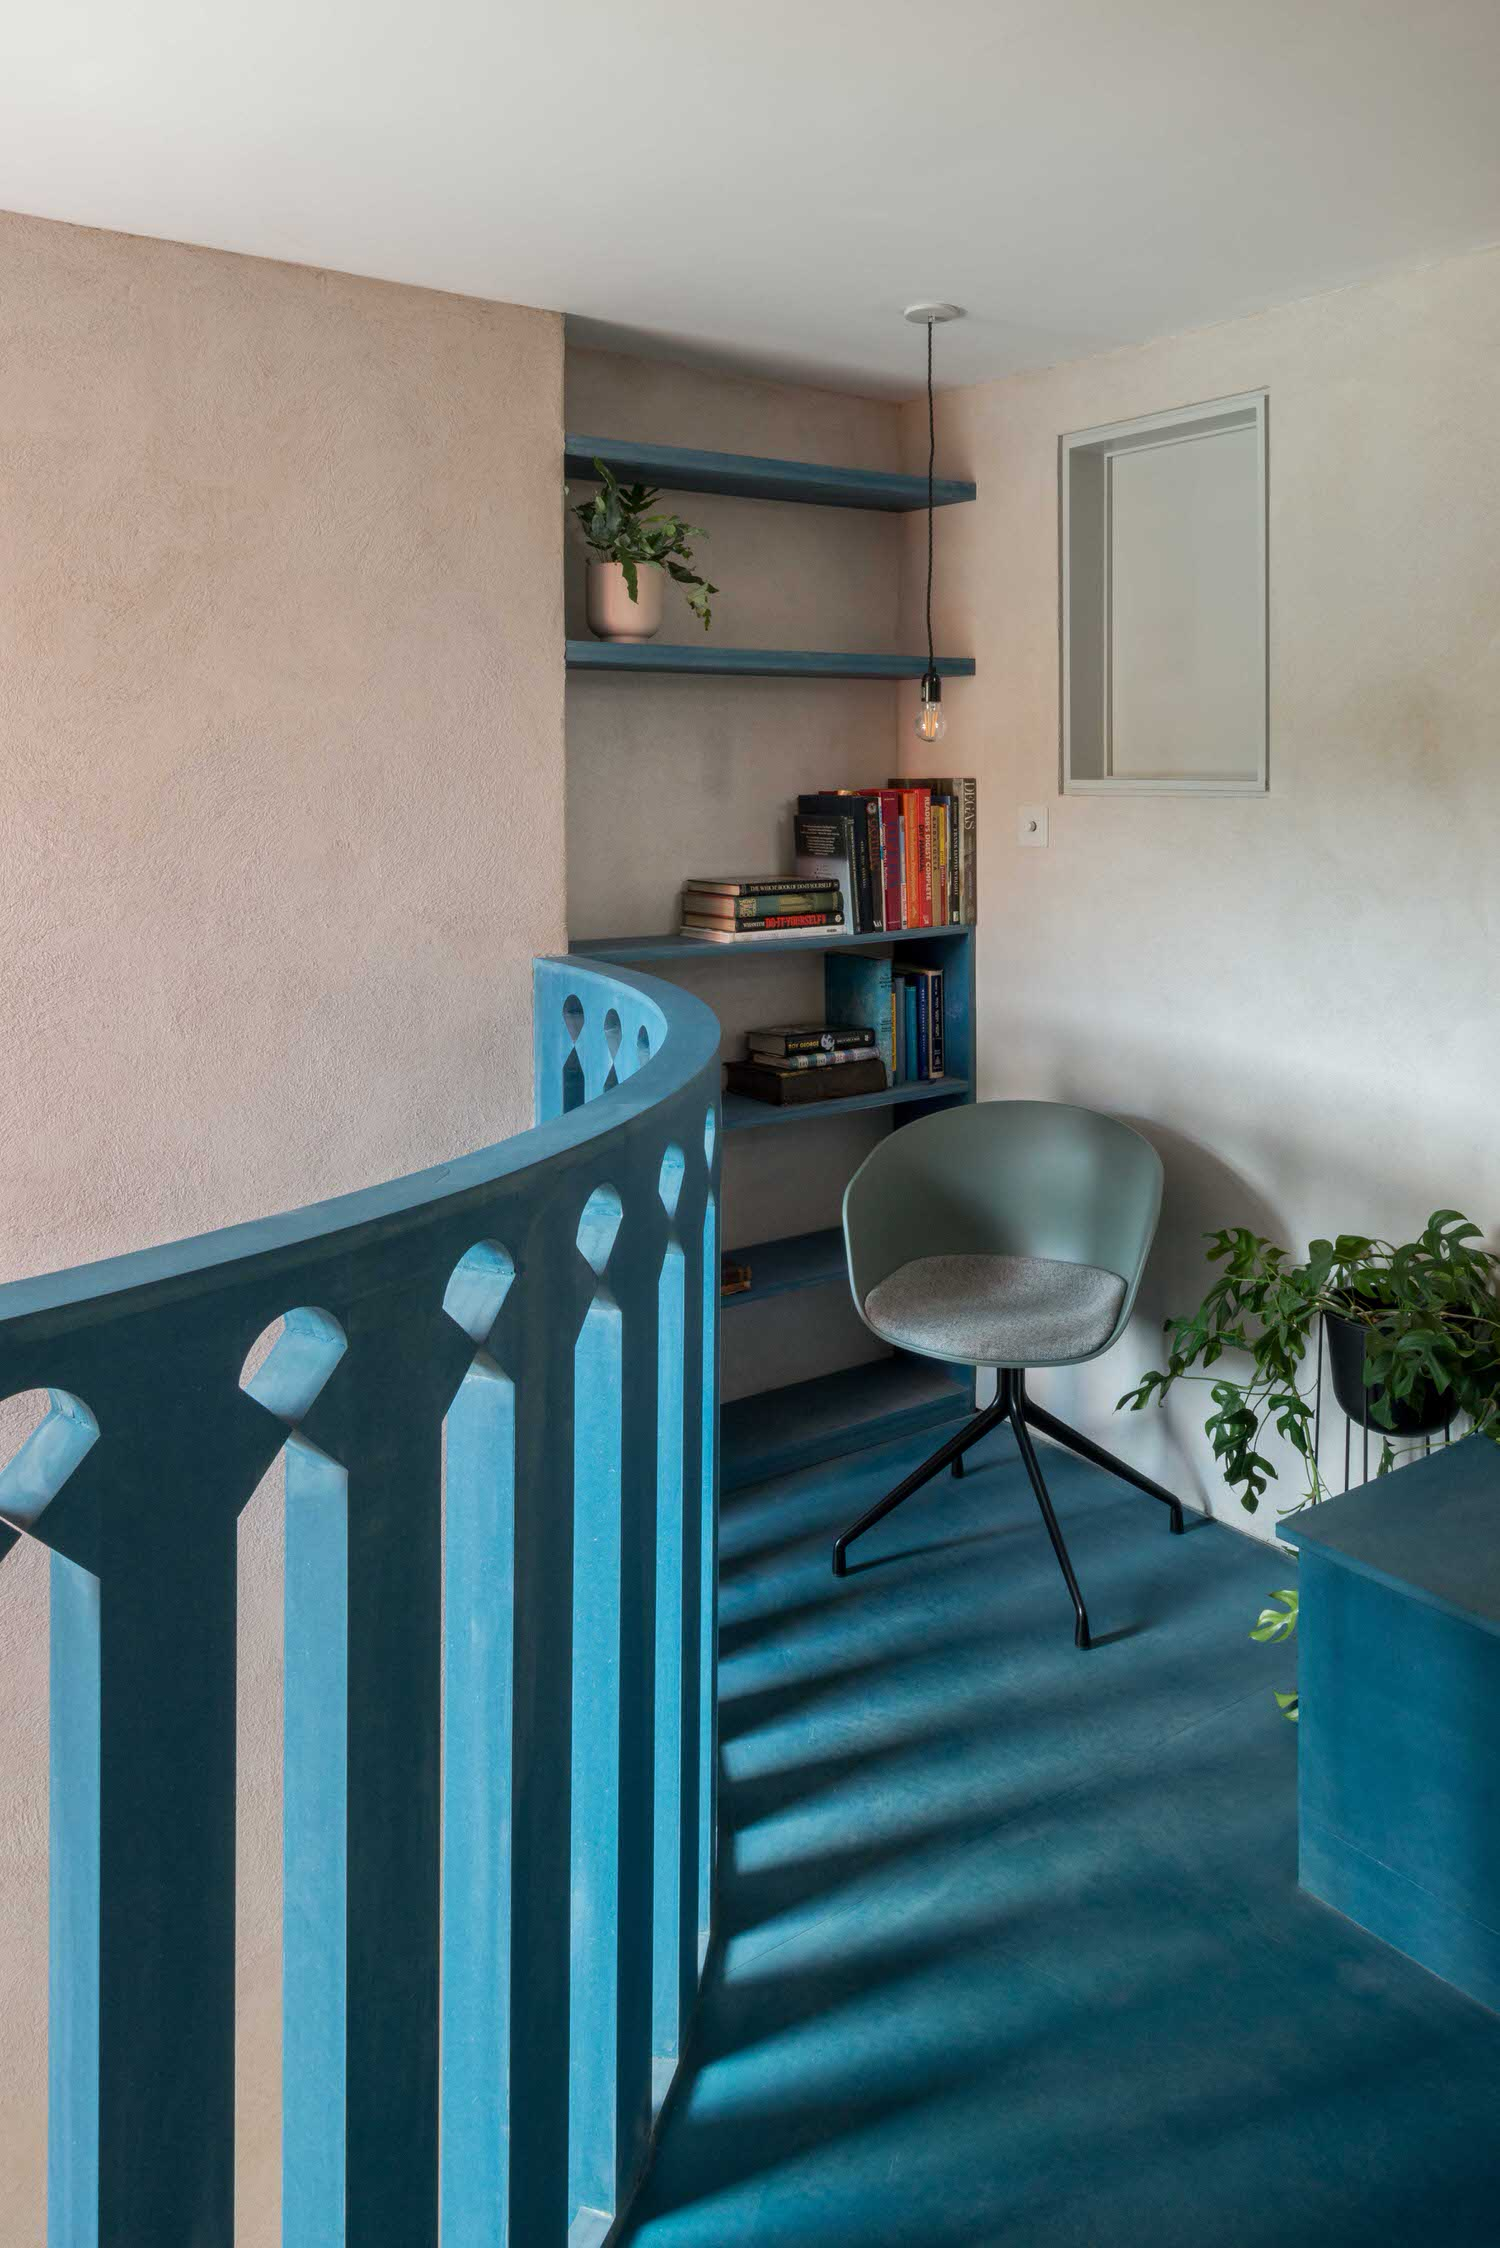 Studio Ben Allen House Recast London Residential Architecture Photo French+tye Yellowtrace 29